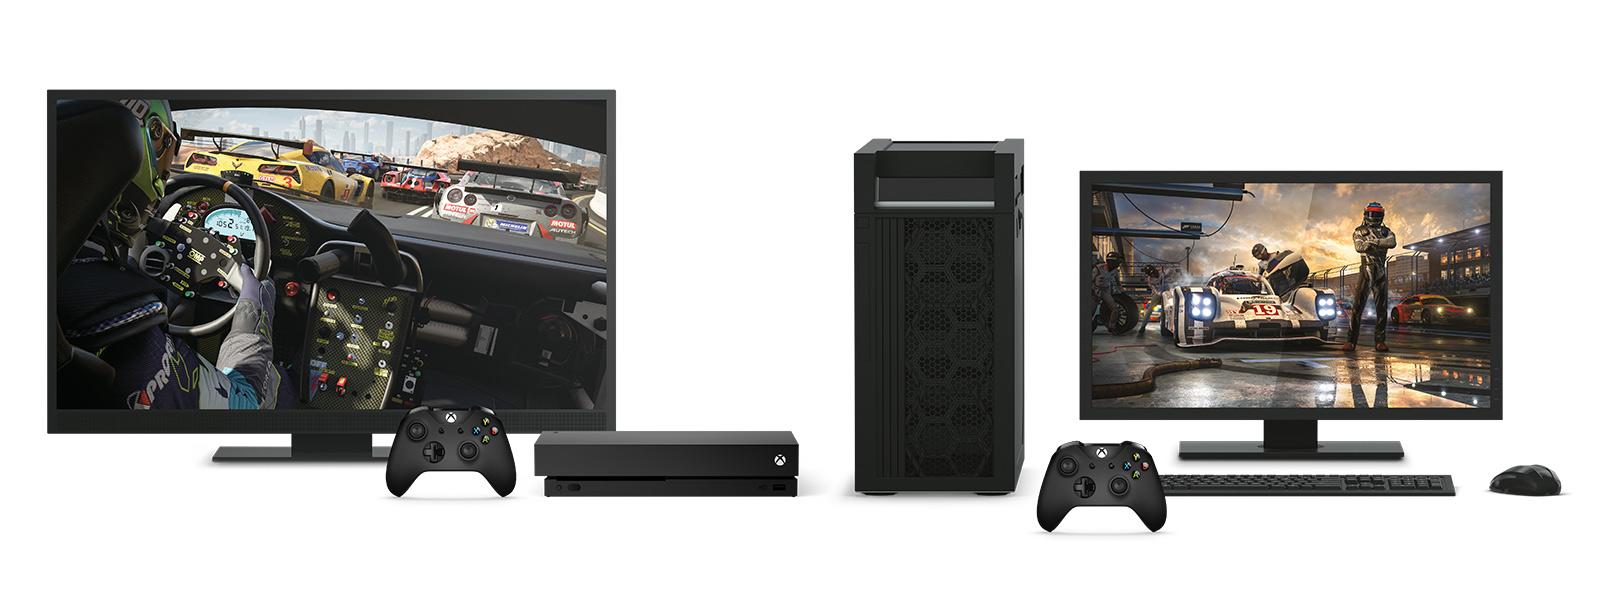 TV와 컴퓨터 화면에 Forza Motorsport 7이 보이는 Xbox One X 및 4K 데스크톱 디바이스